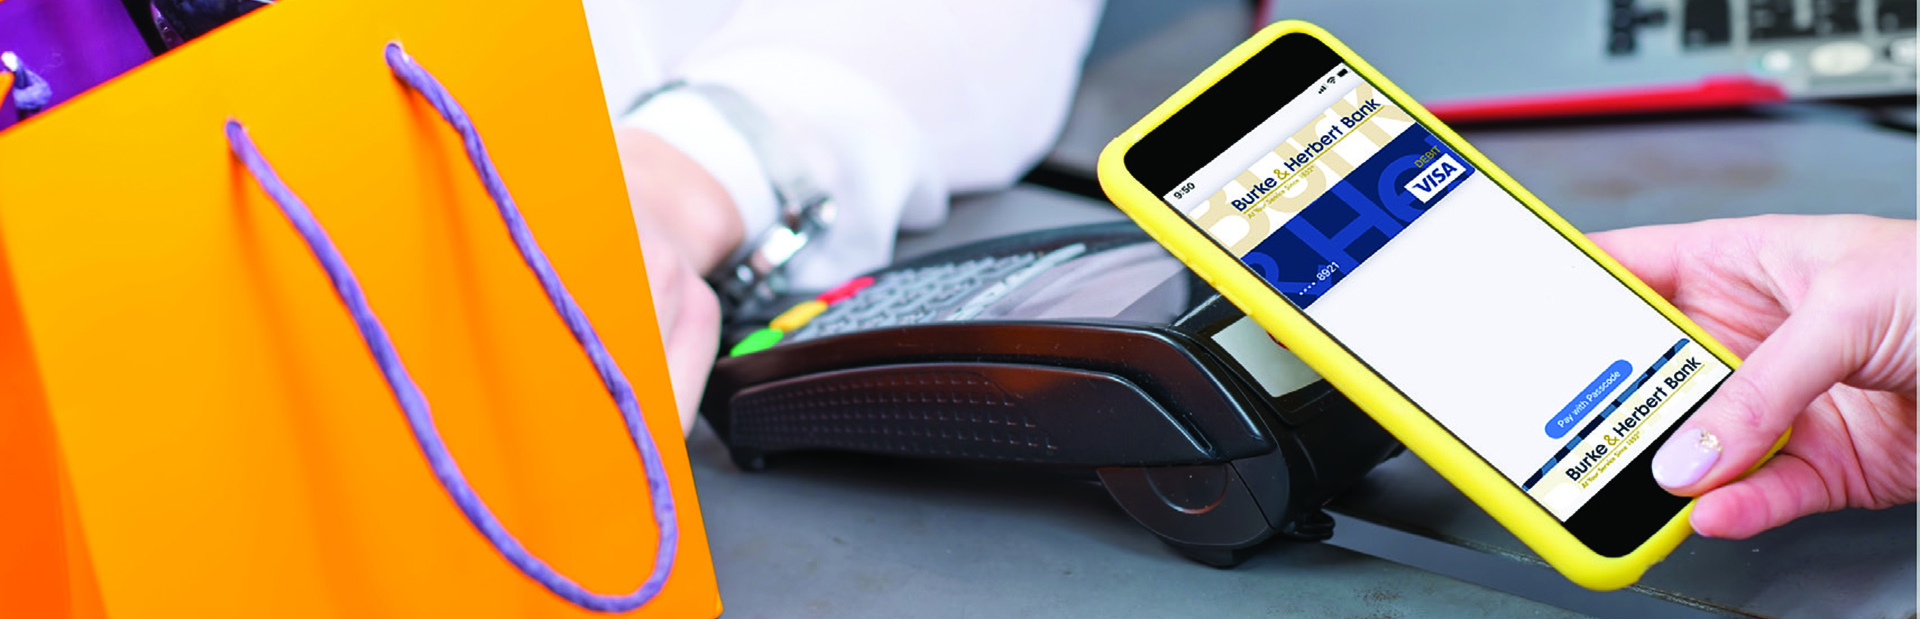 Paying with App using Burke & Herbert's Digital Wallet